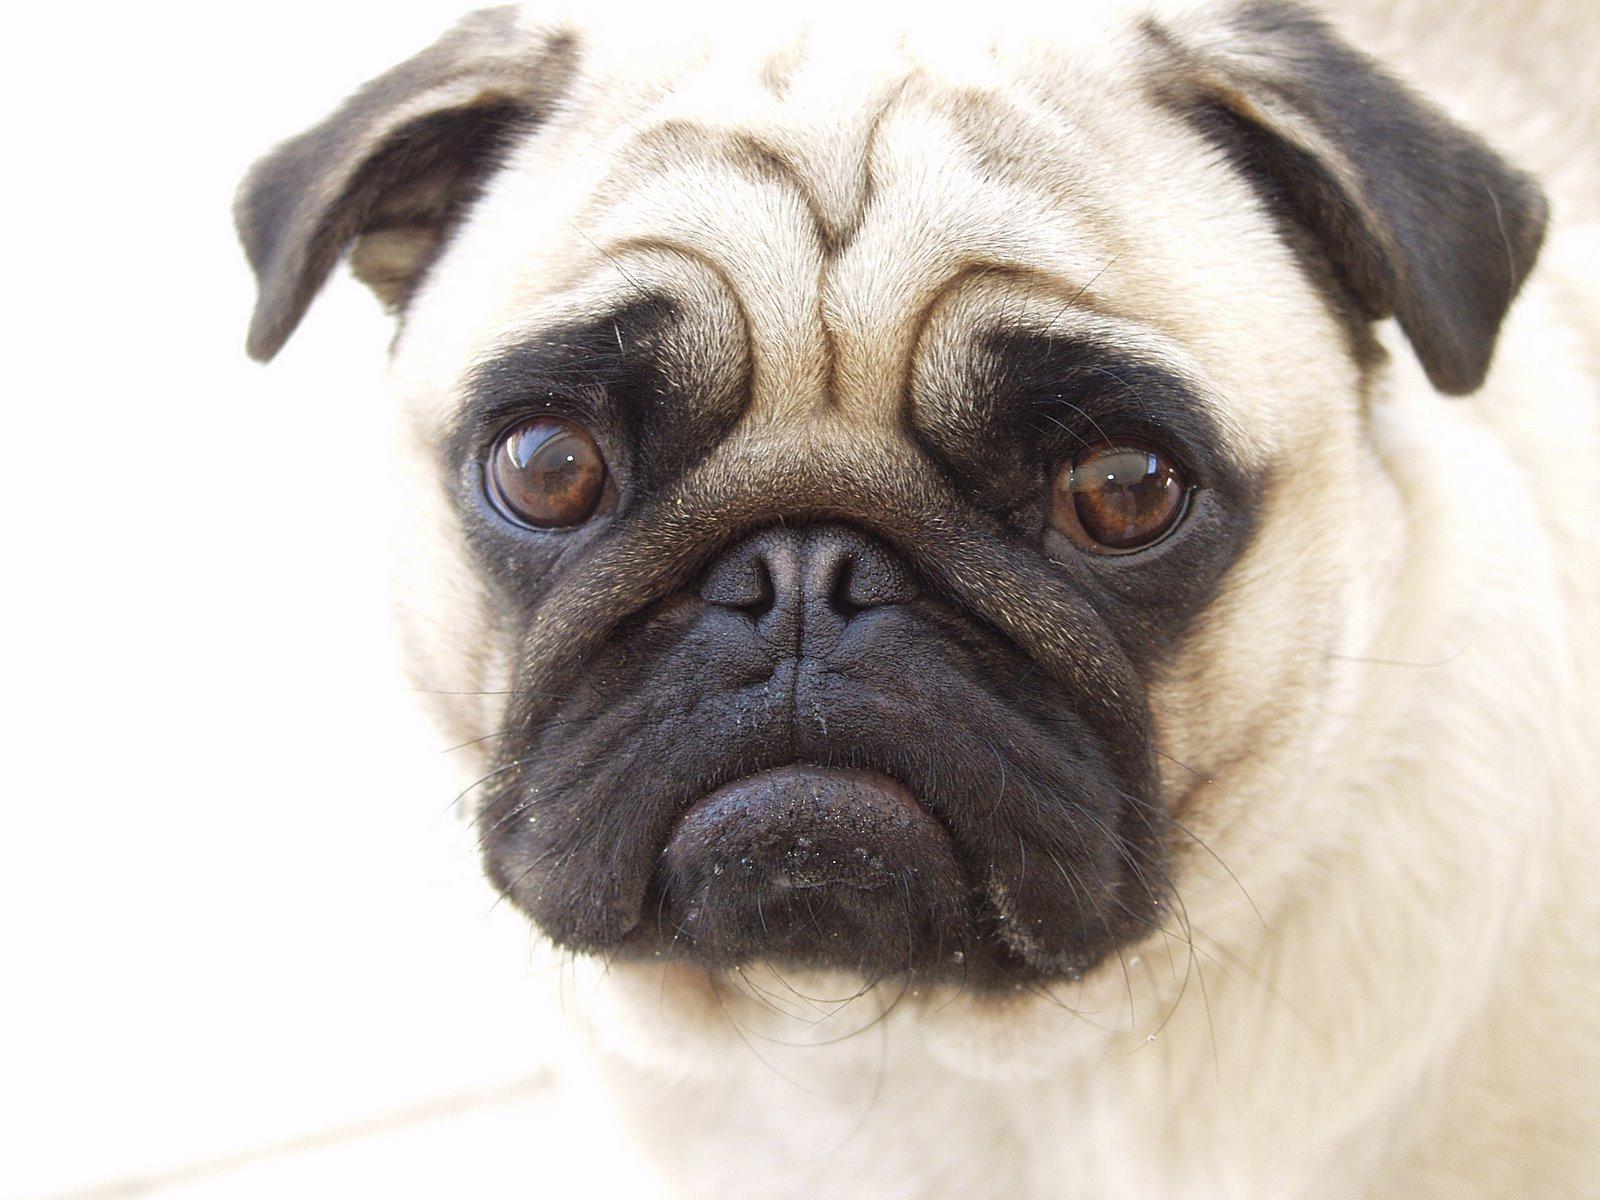 بالصور صور كلاب صور كلاب جديدة , خلفيات لكلب حراسه 4052 3